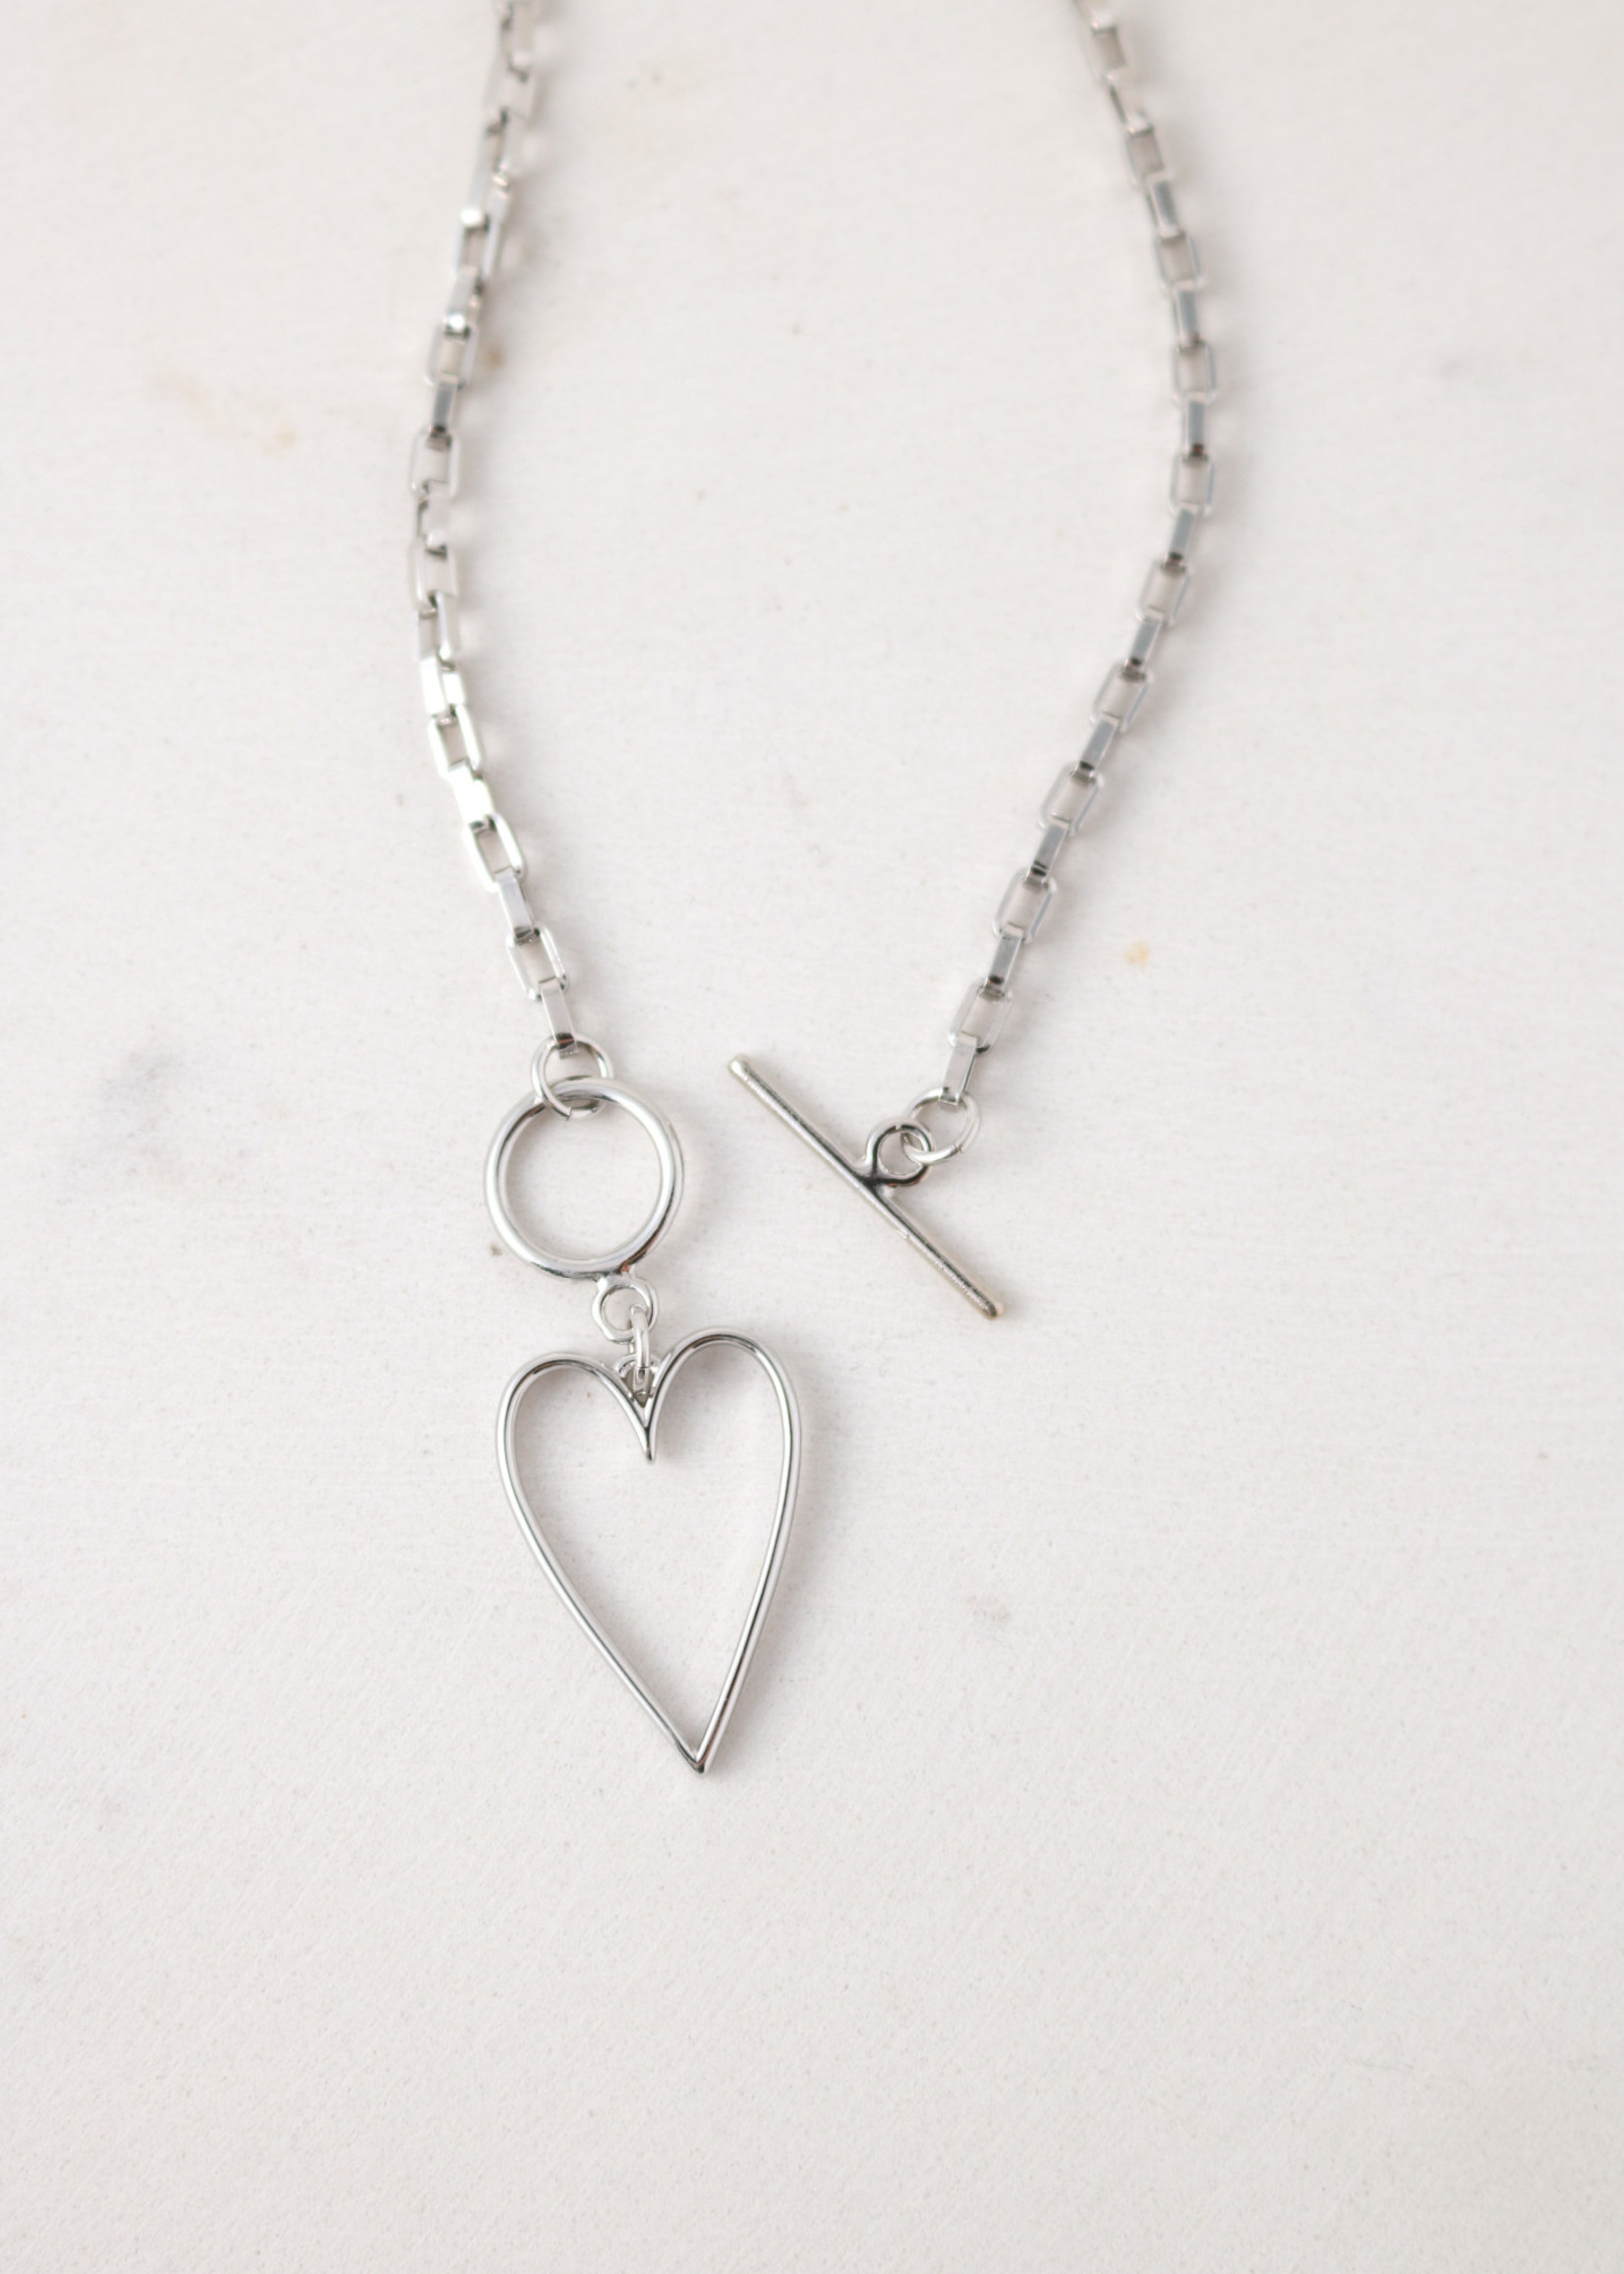 Lovestruck Heart Necklace Silver